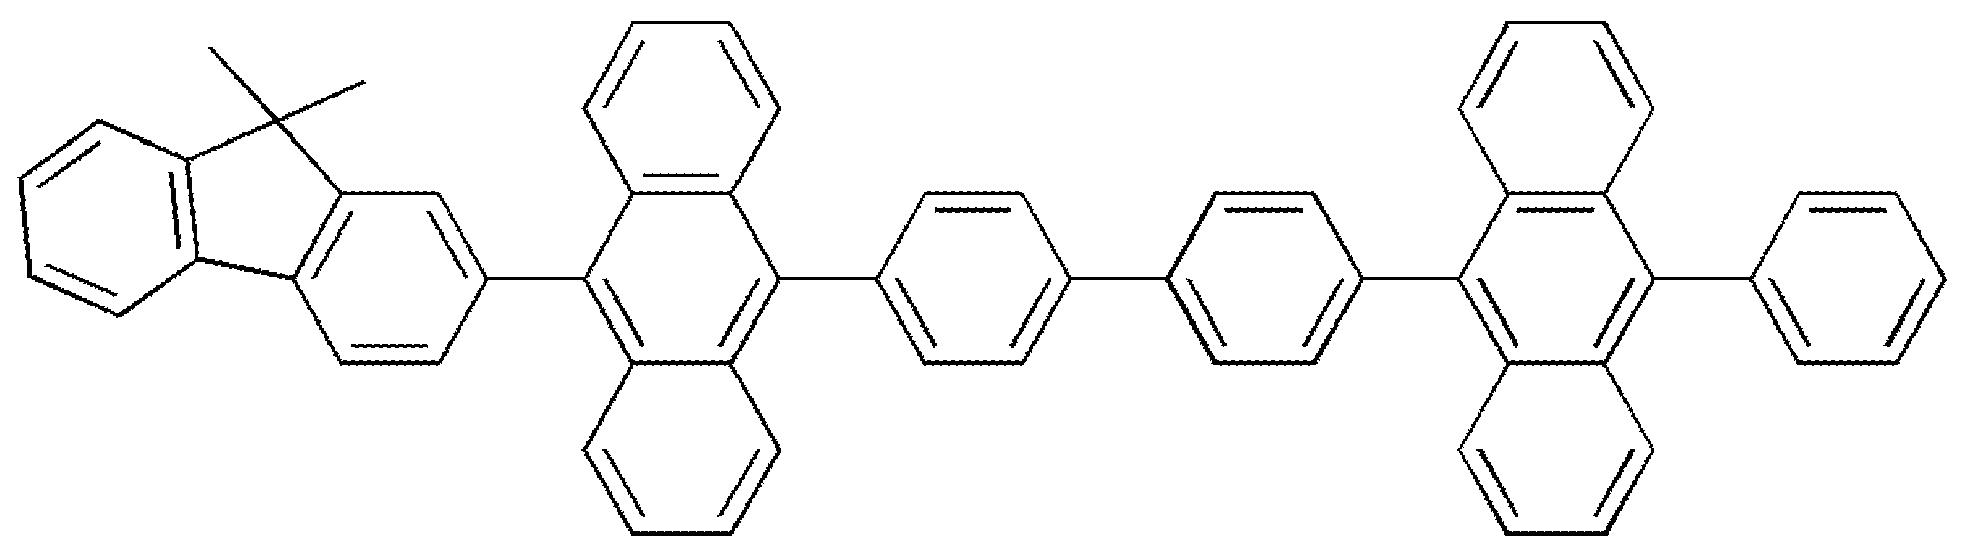 Figure 112007087103673-pat00663